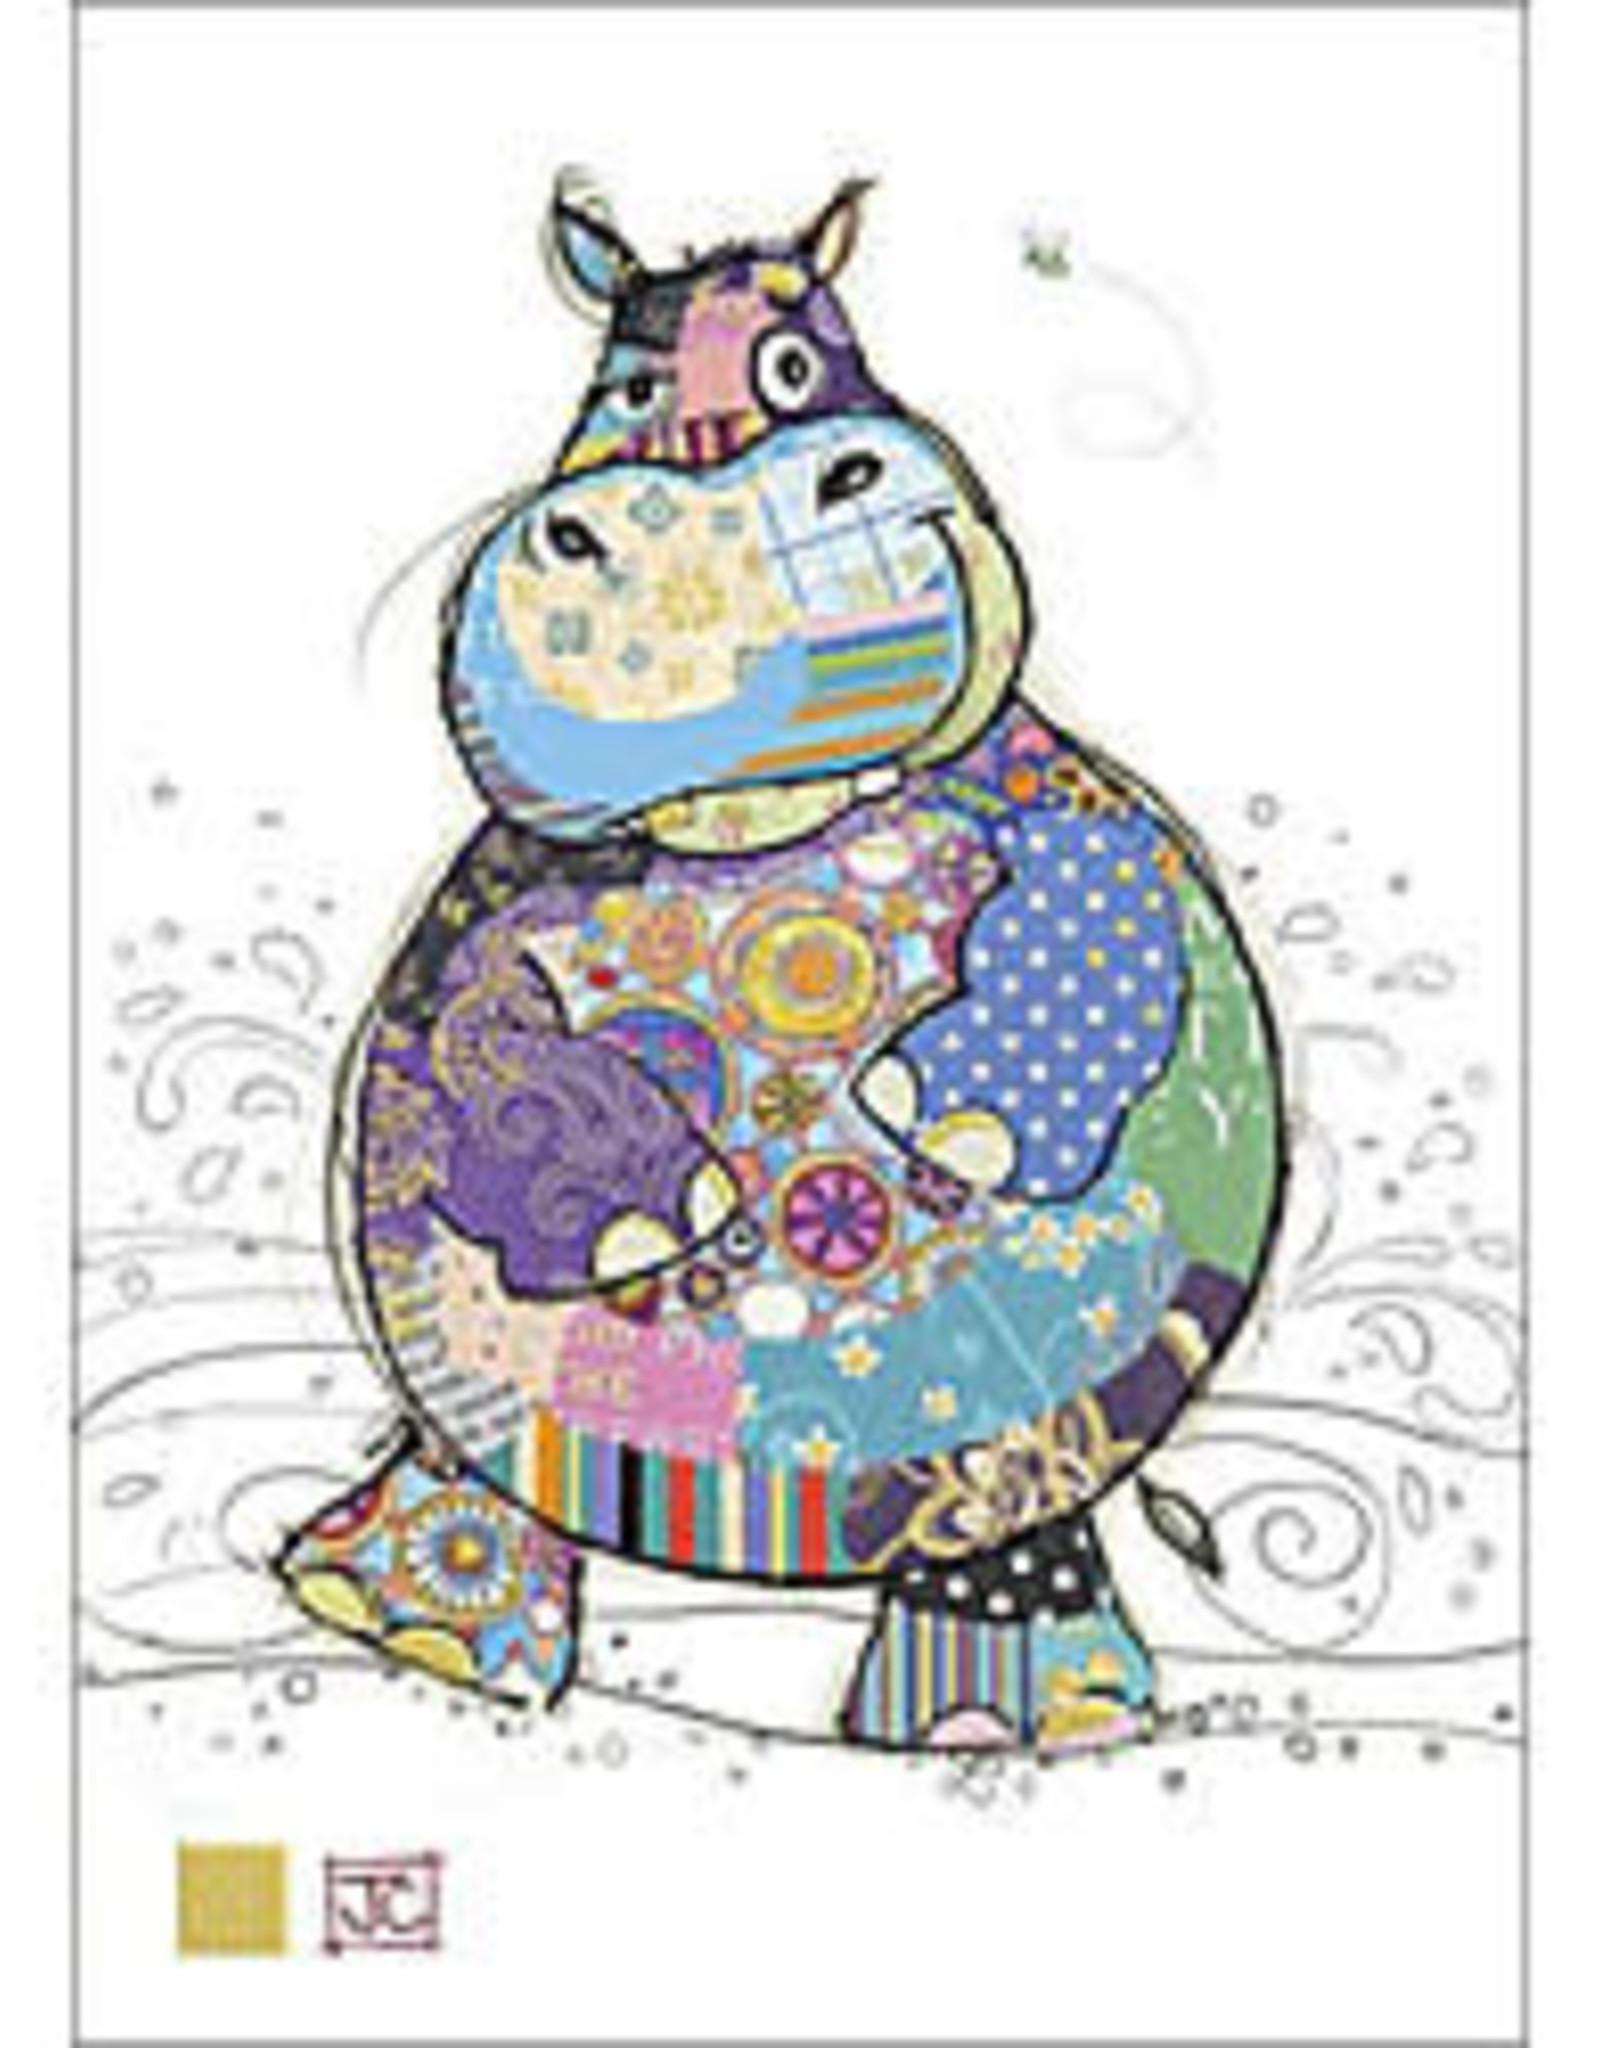 Incognito Card Kooks-Harry Hippo